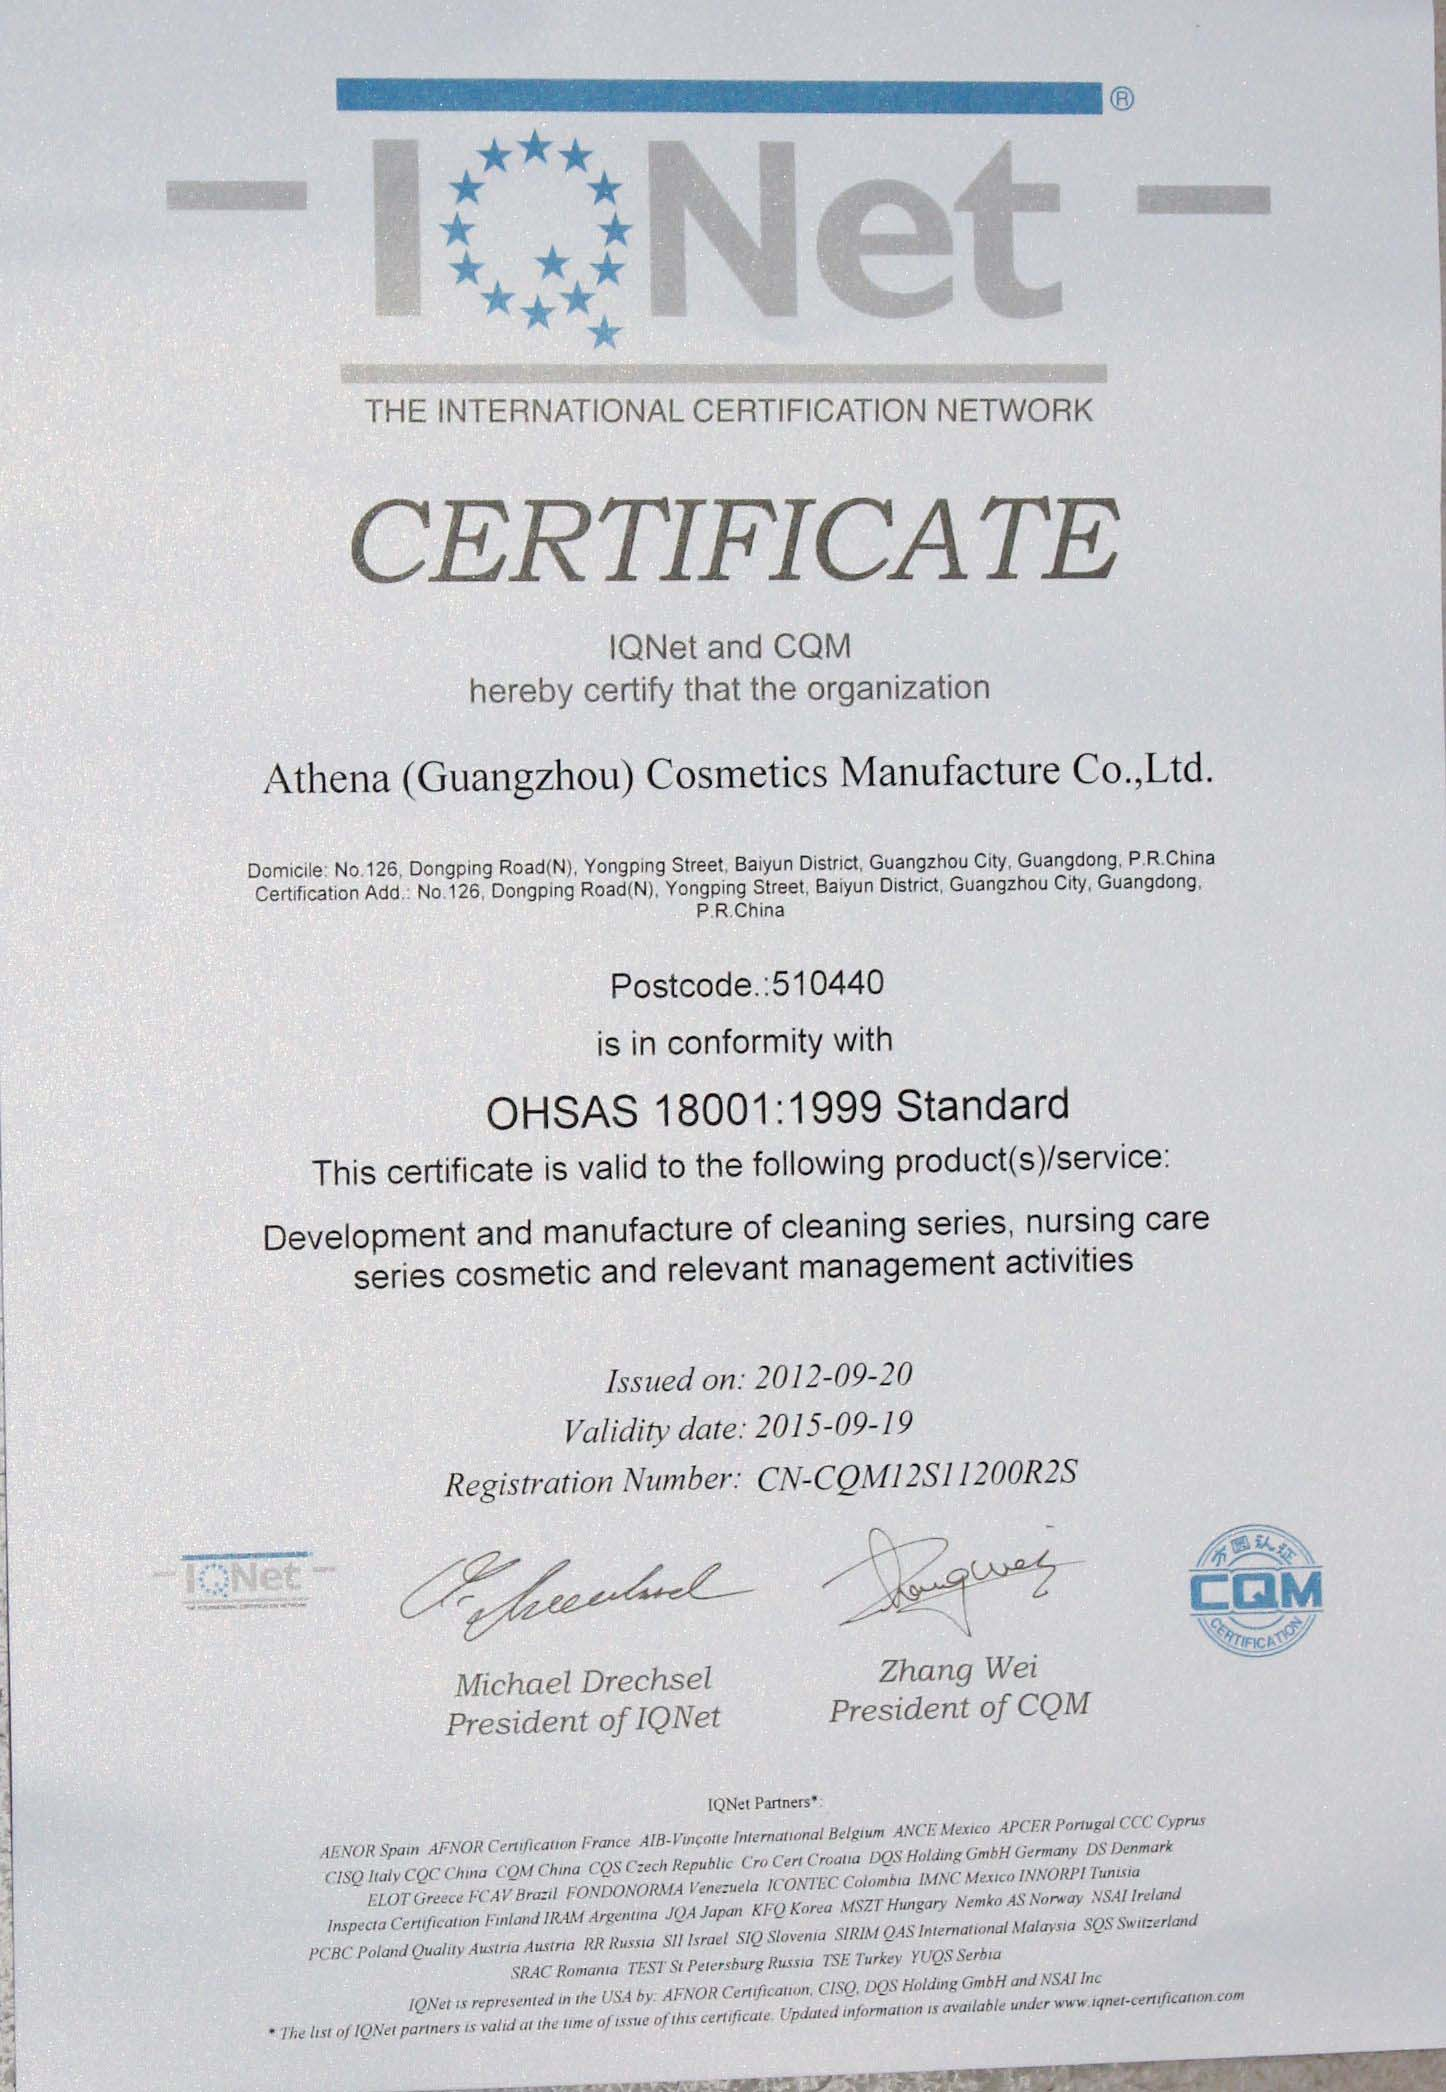 IQNET 14001:2004 Standard